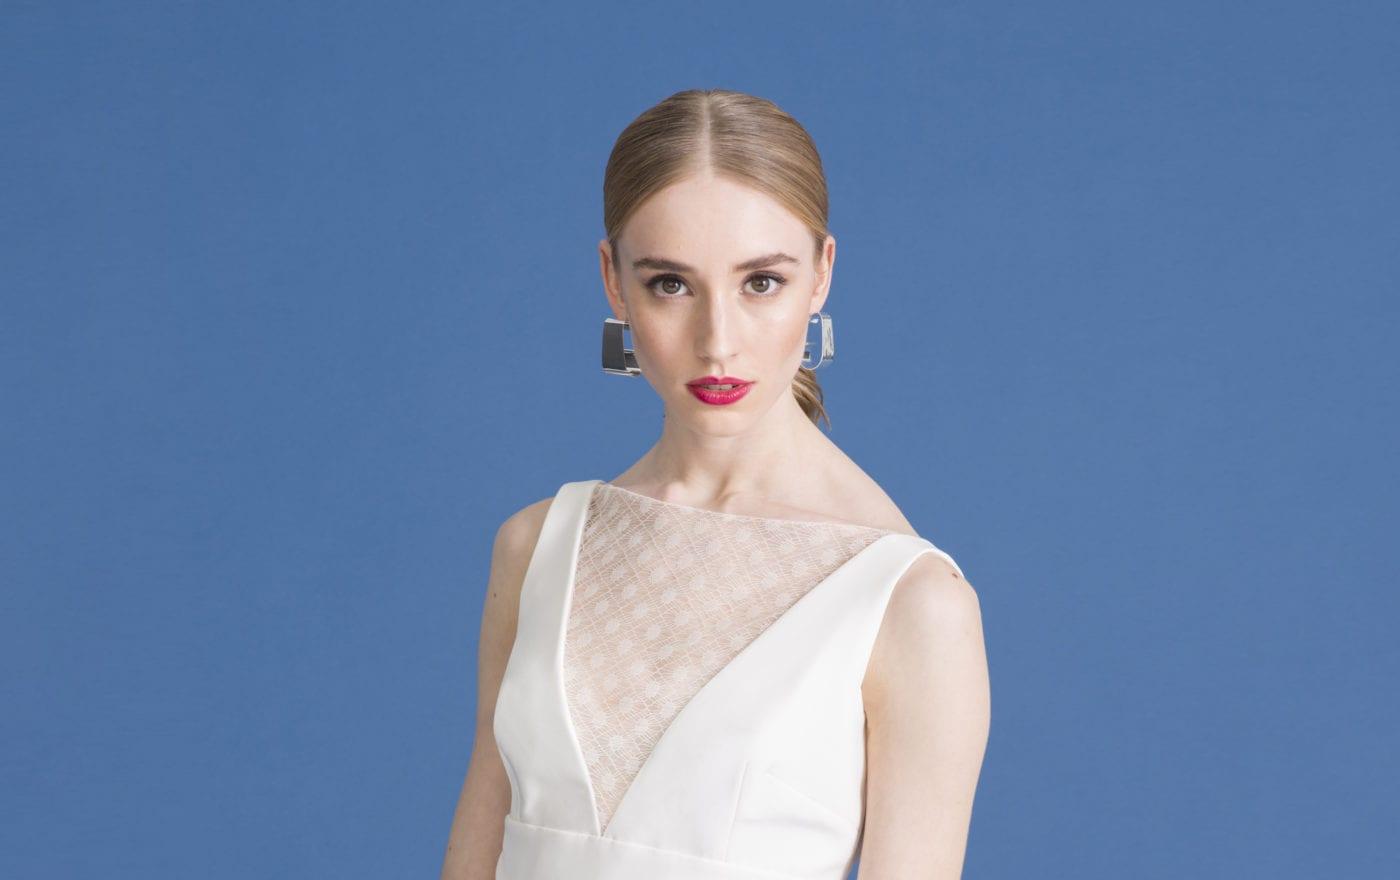 sleeveless v neck empire wedding dress with lace overlay